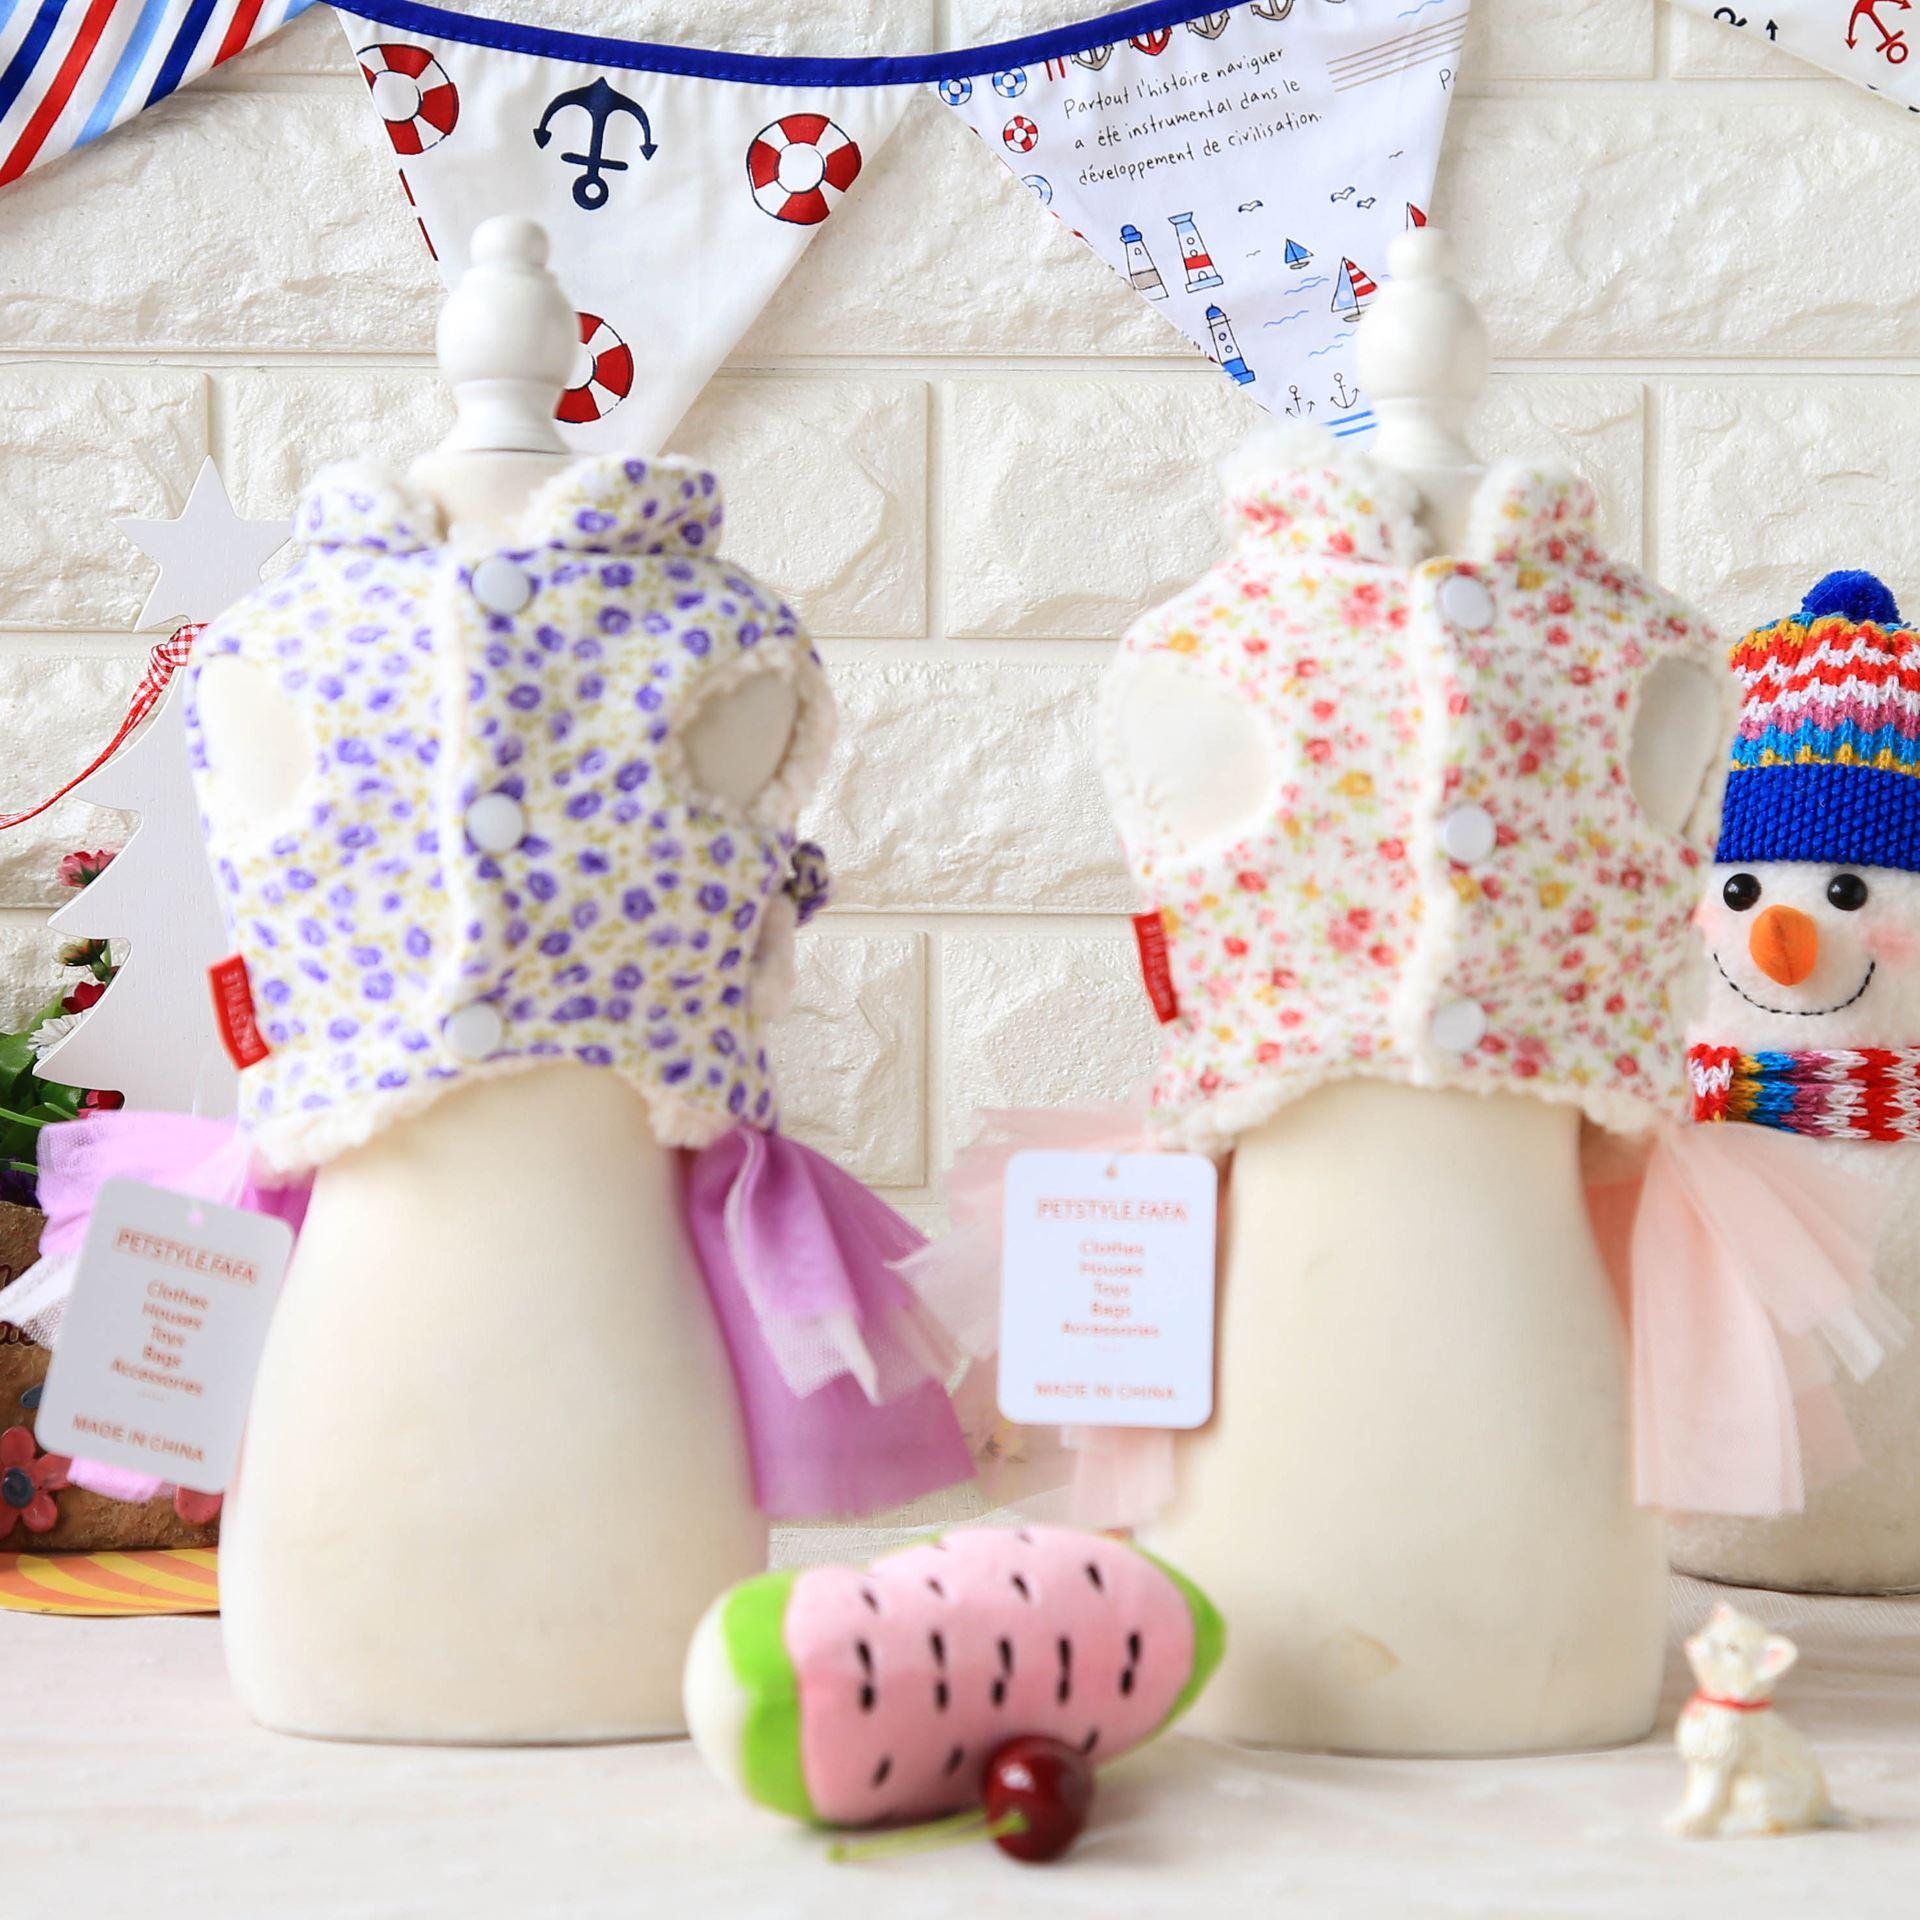 Pet new floral cotton padded jacket teddy bear pet dog dress with velvet yarn skirt Republic of China dress